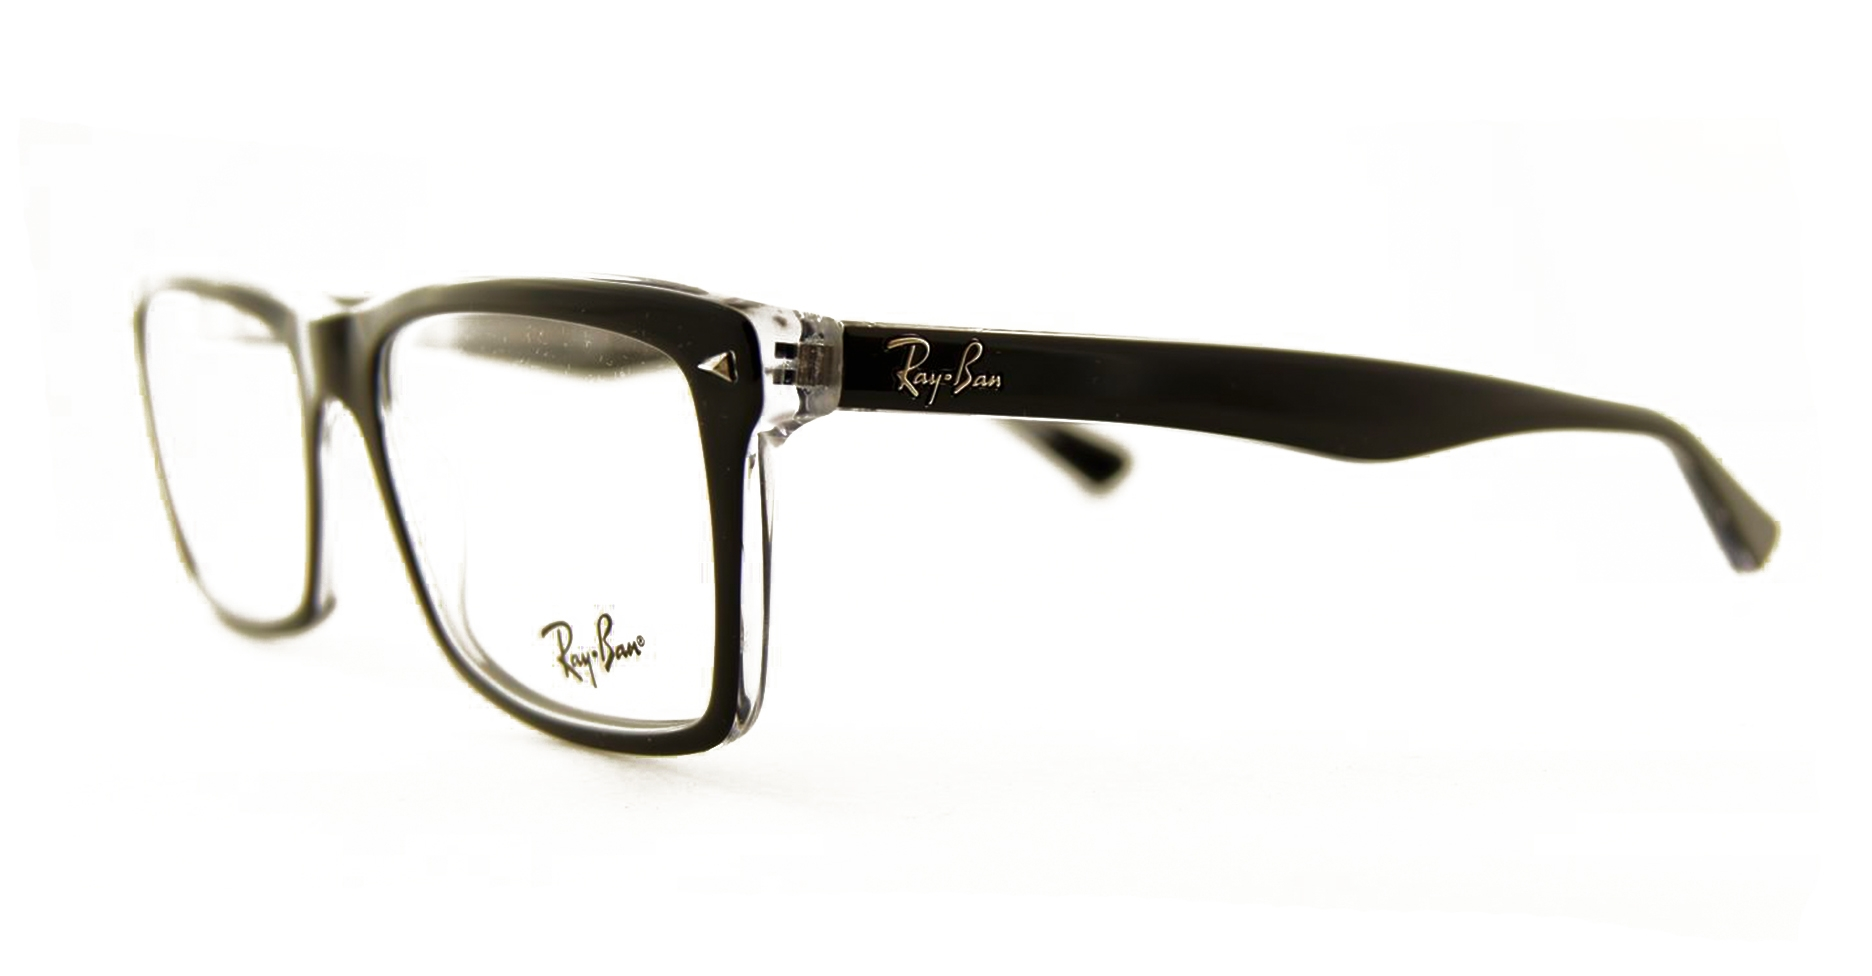 okulary ray ban wayfarer korekcyjne